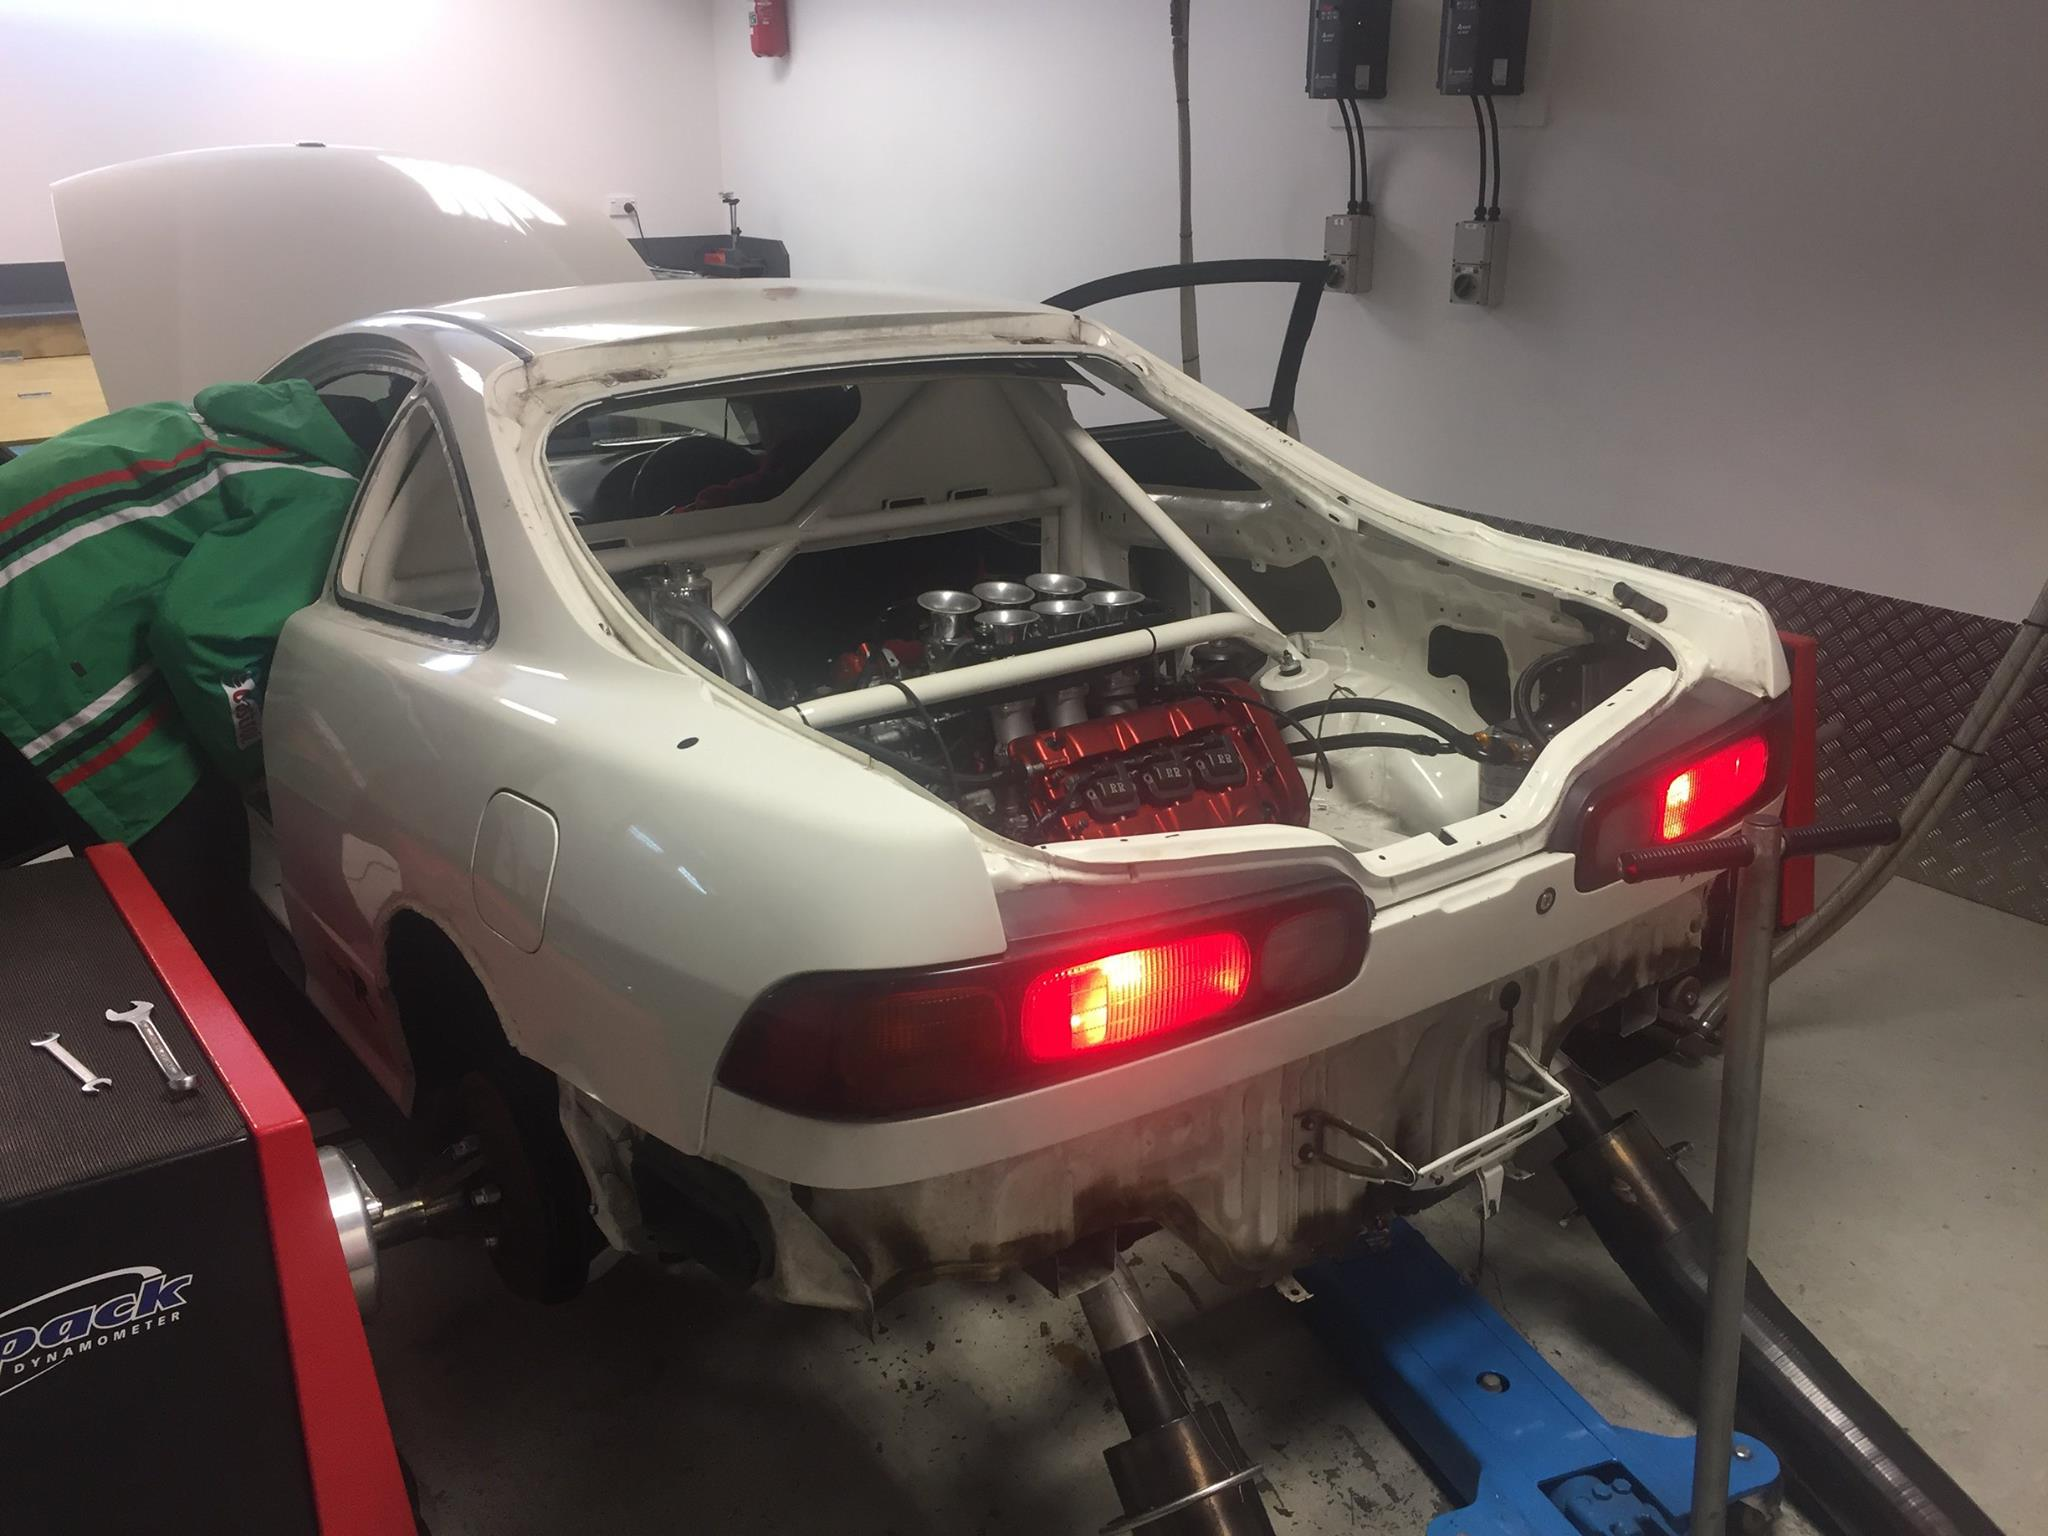 Rwd Honda Integra With A Mid Engine Nsx C V